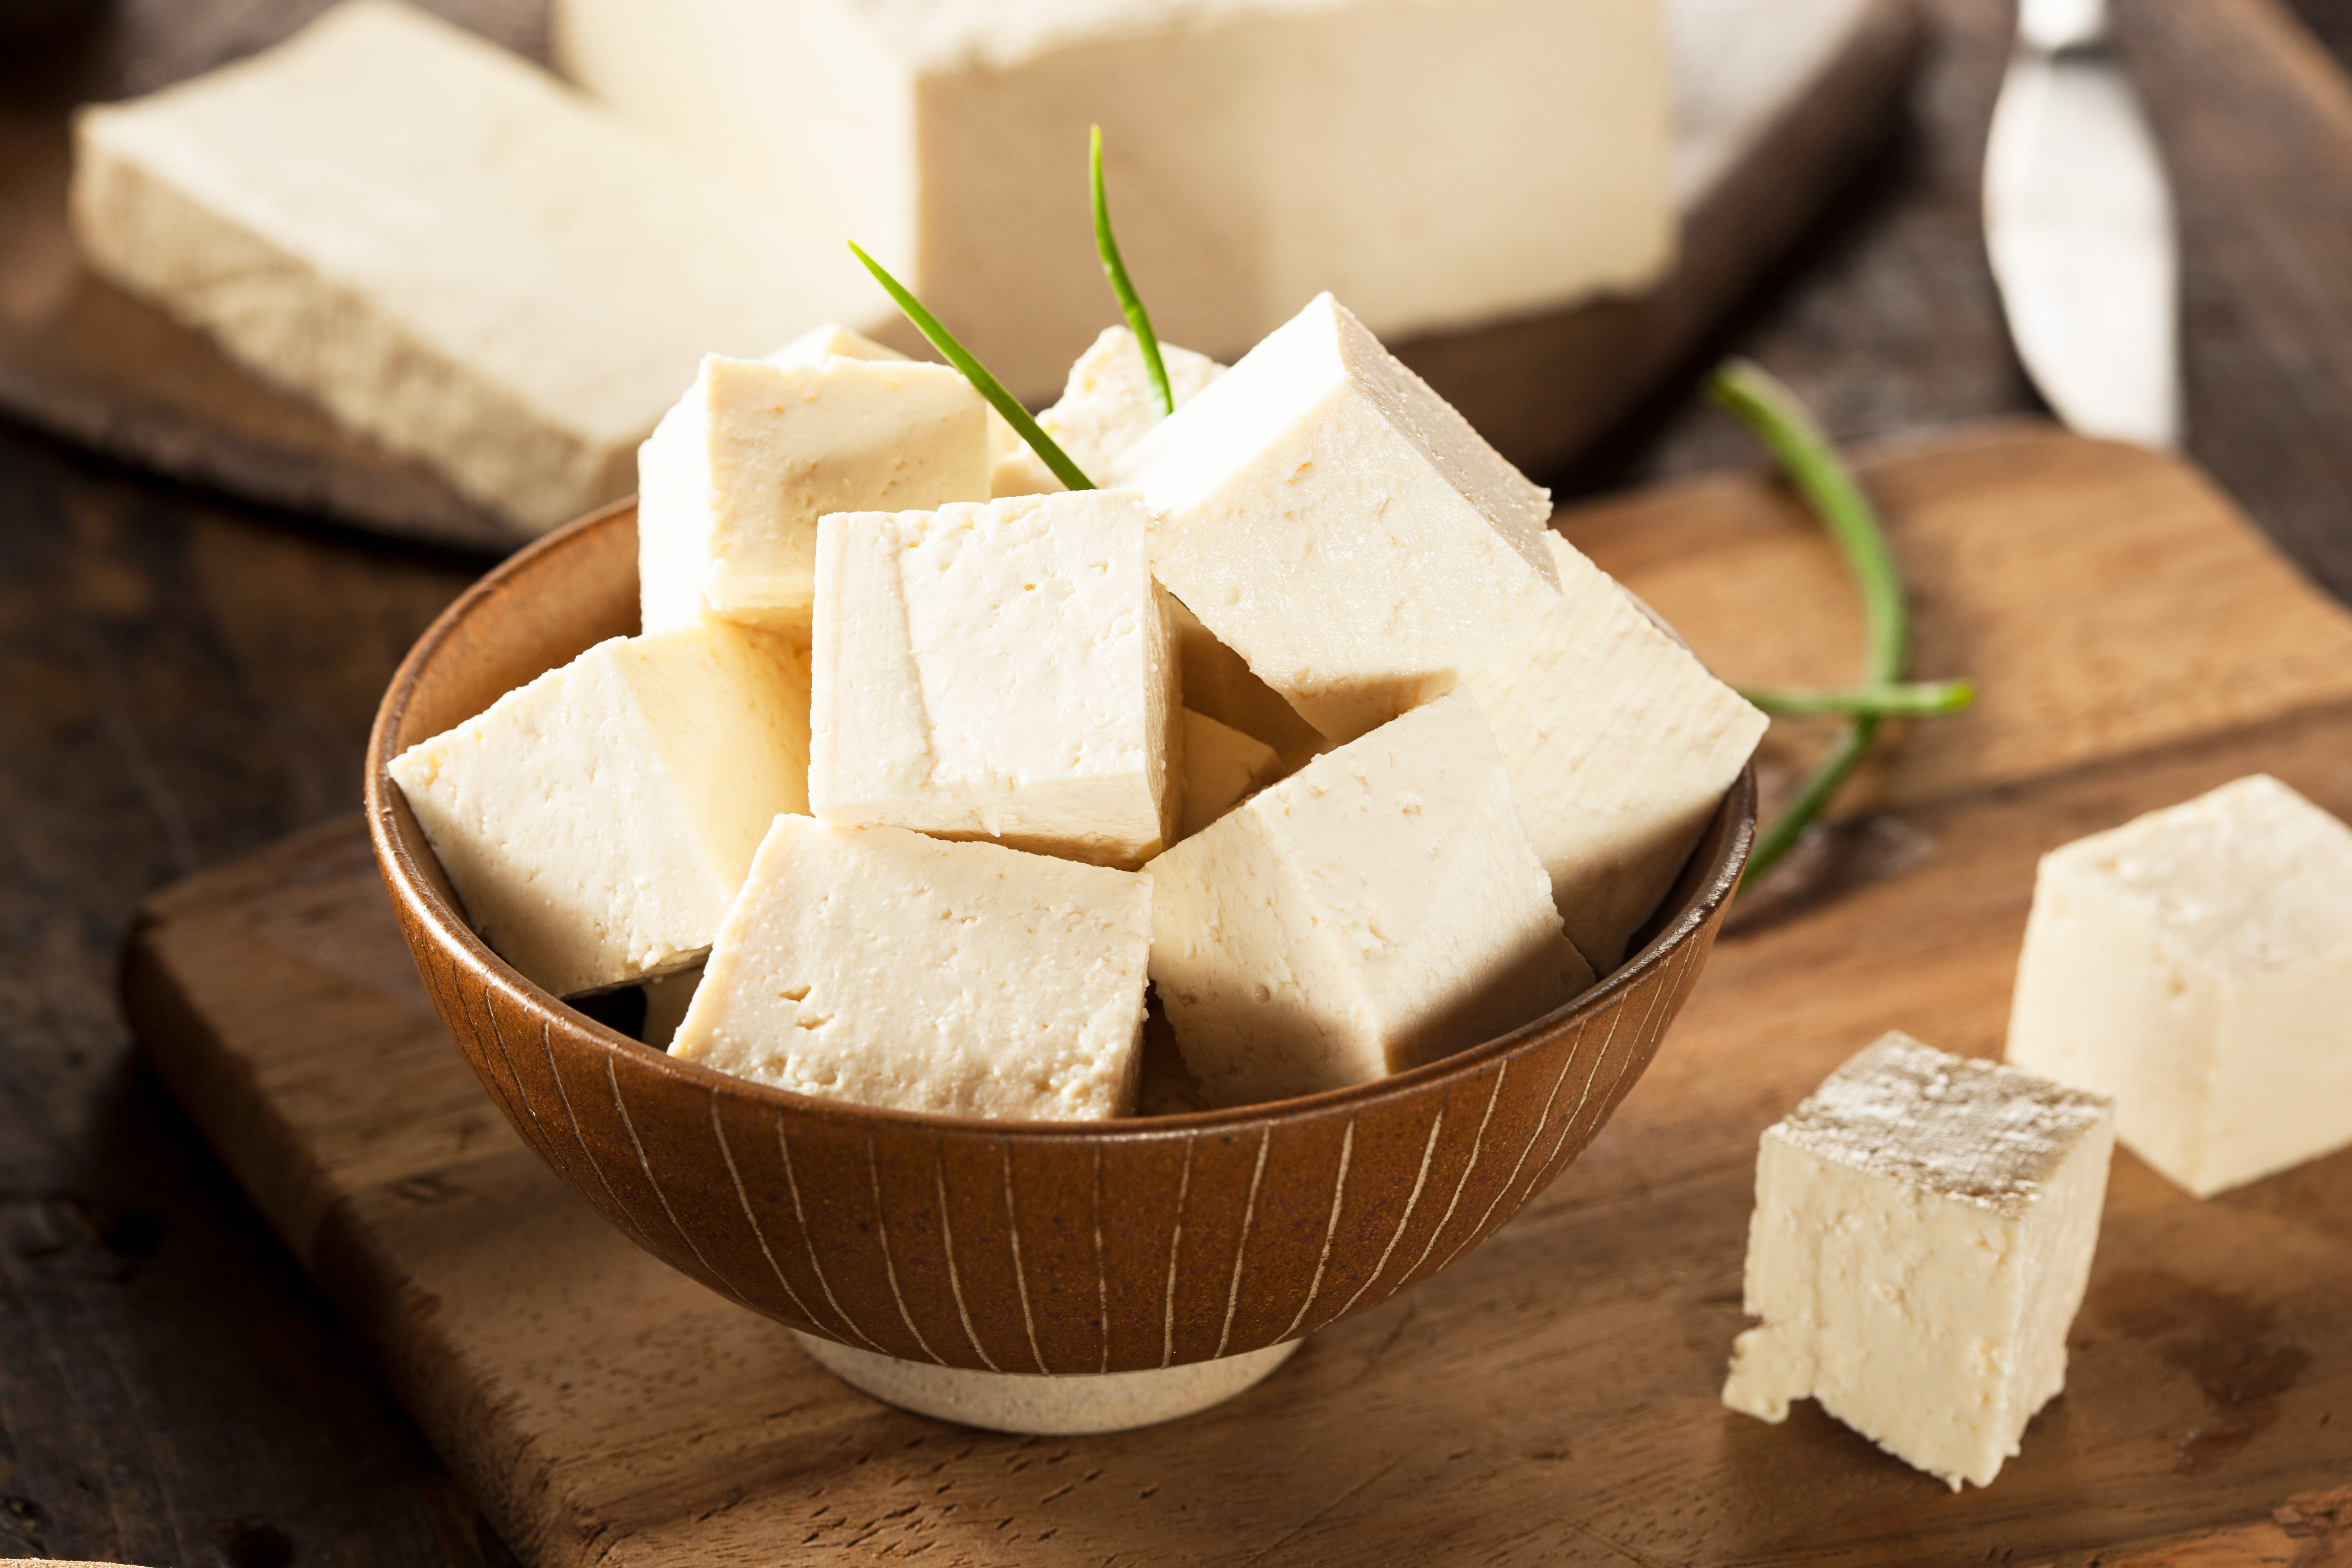 VegNews.Tofu